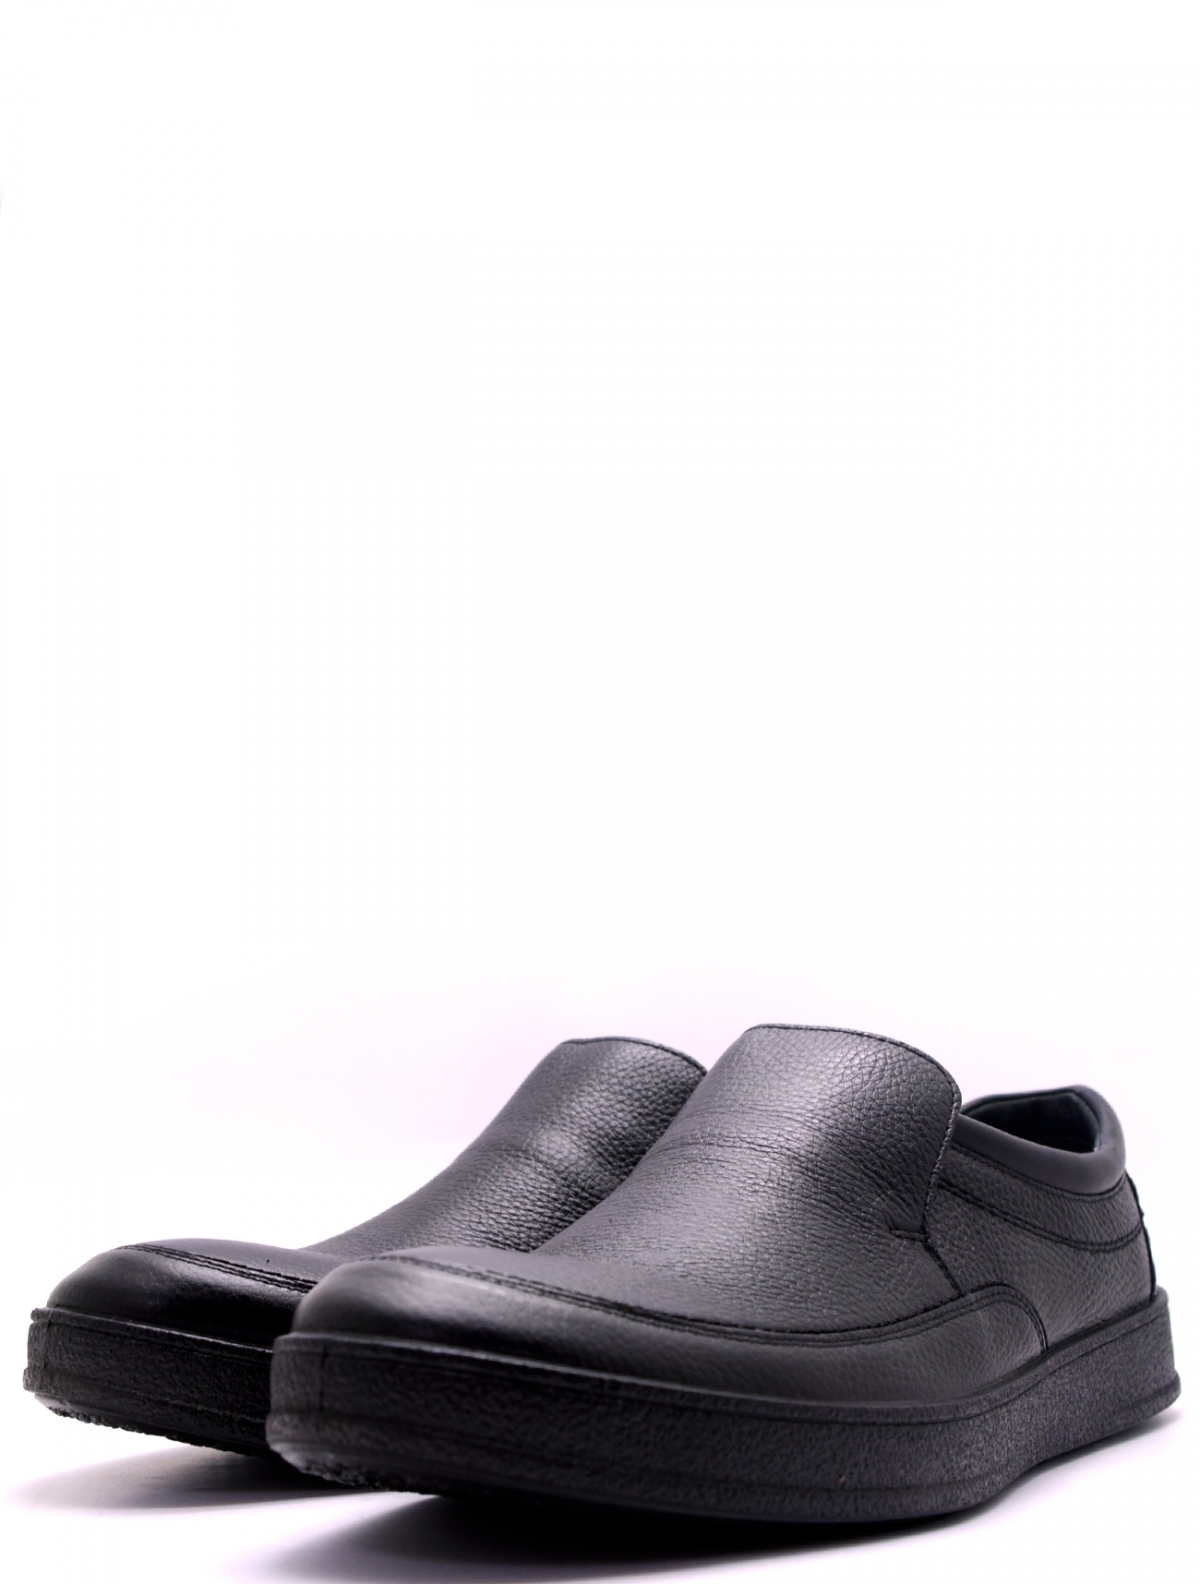 Marko 47205 мужские туфли